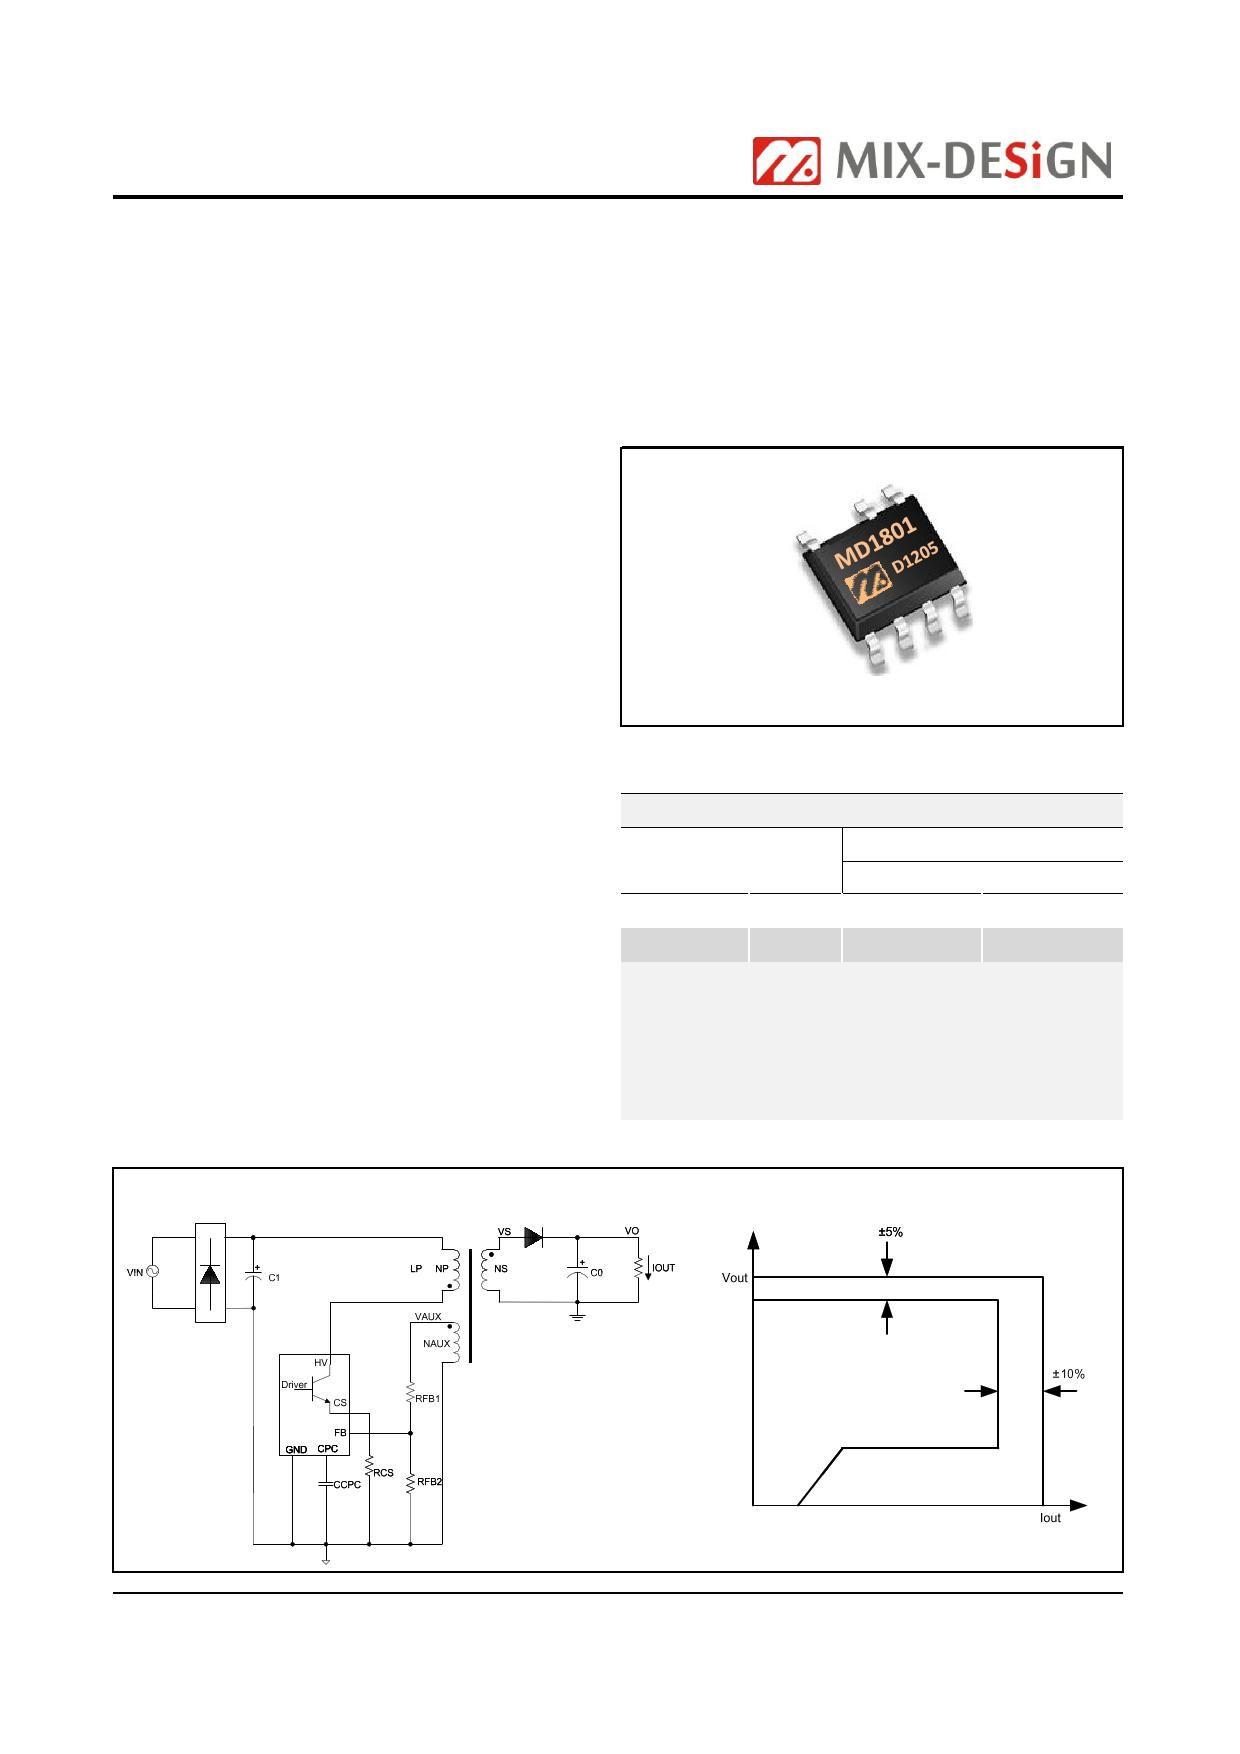 MD1801 데이터시트 및 MD1801 PDF